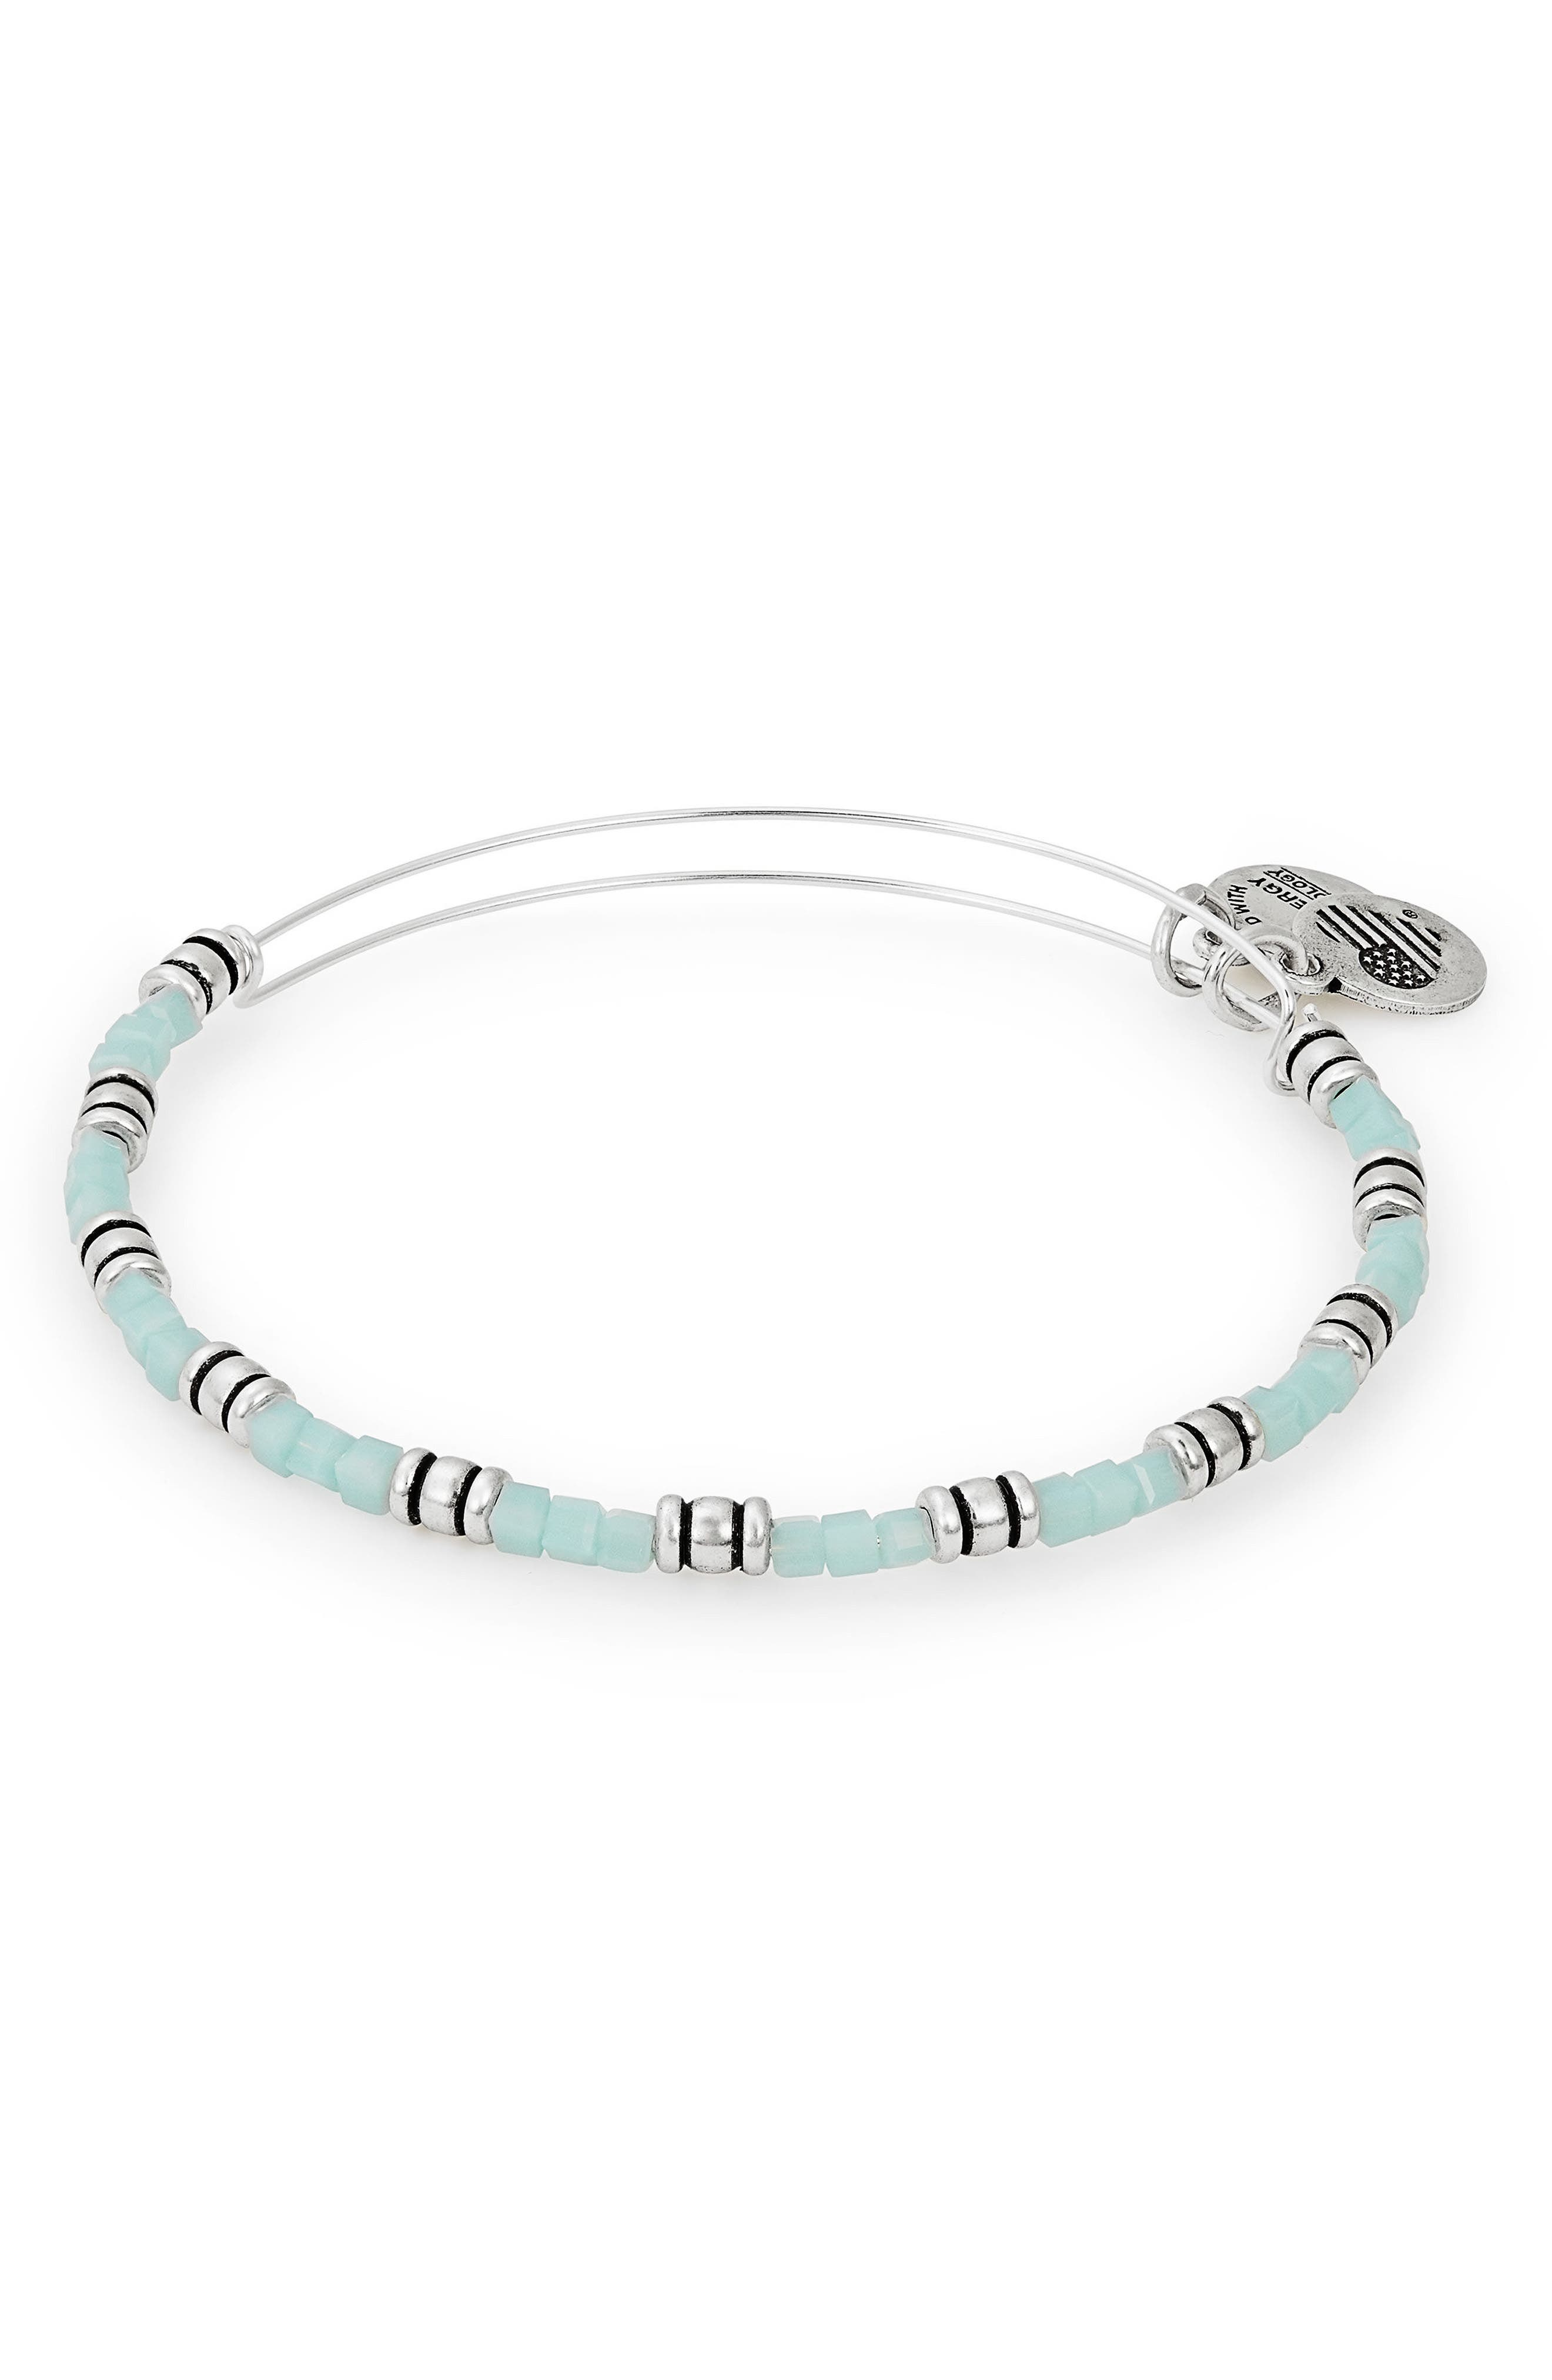 Coastal Ocean Expandable Beaded Bracelet,                             Main thumbnail 1, color,                             040